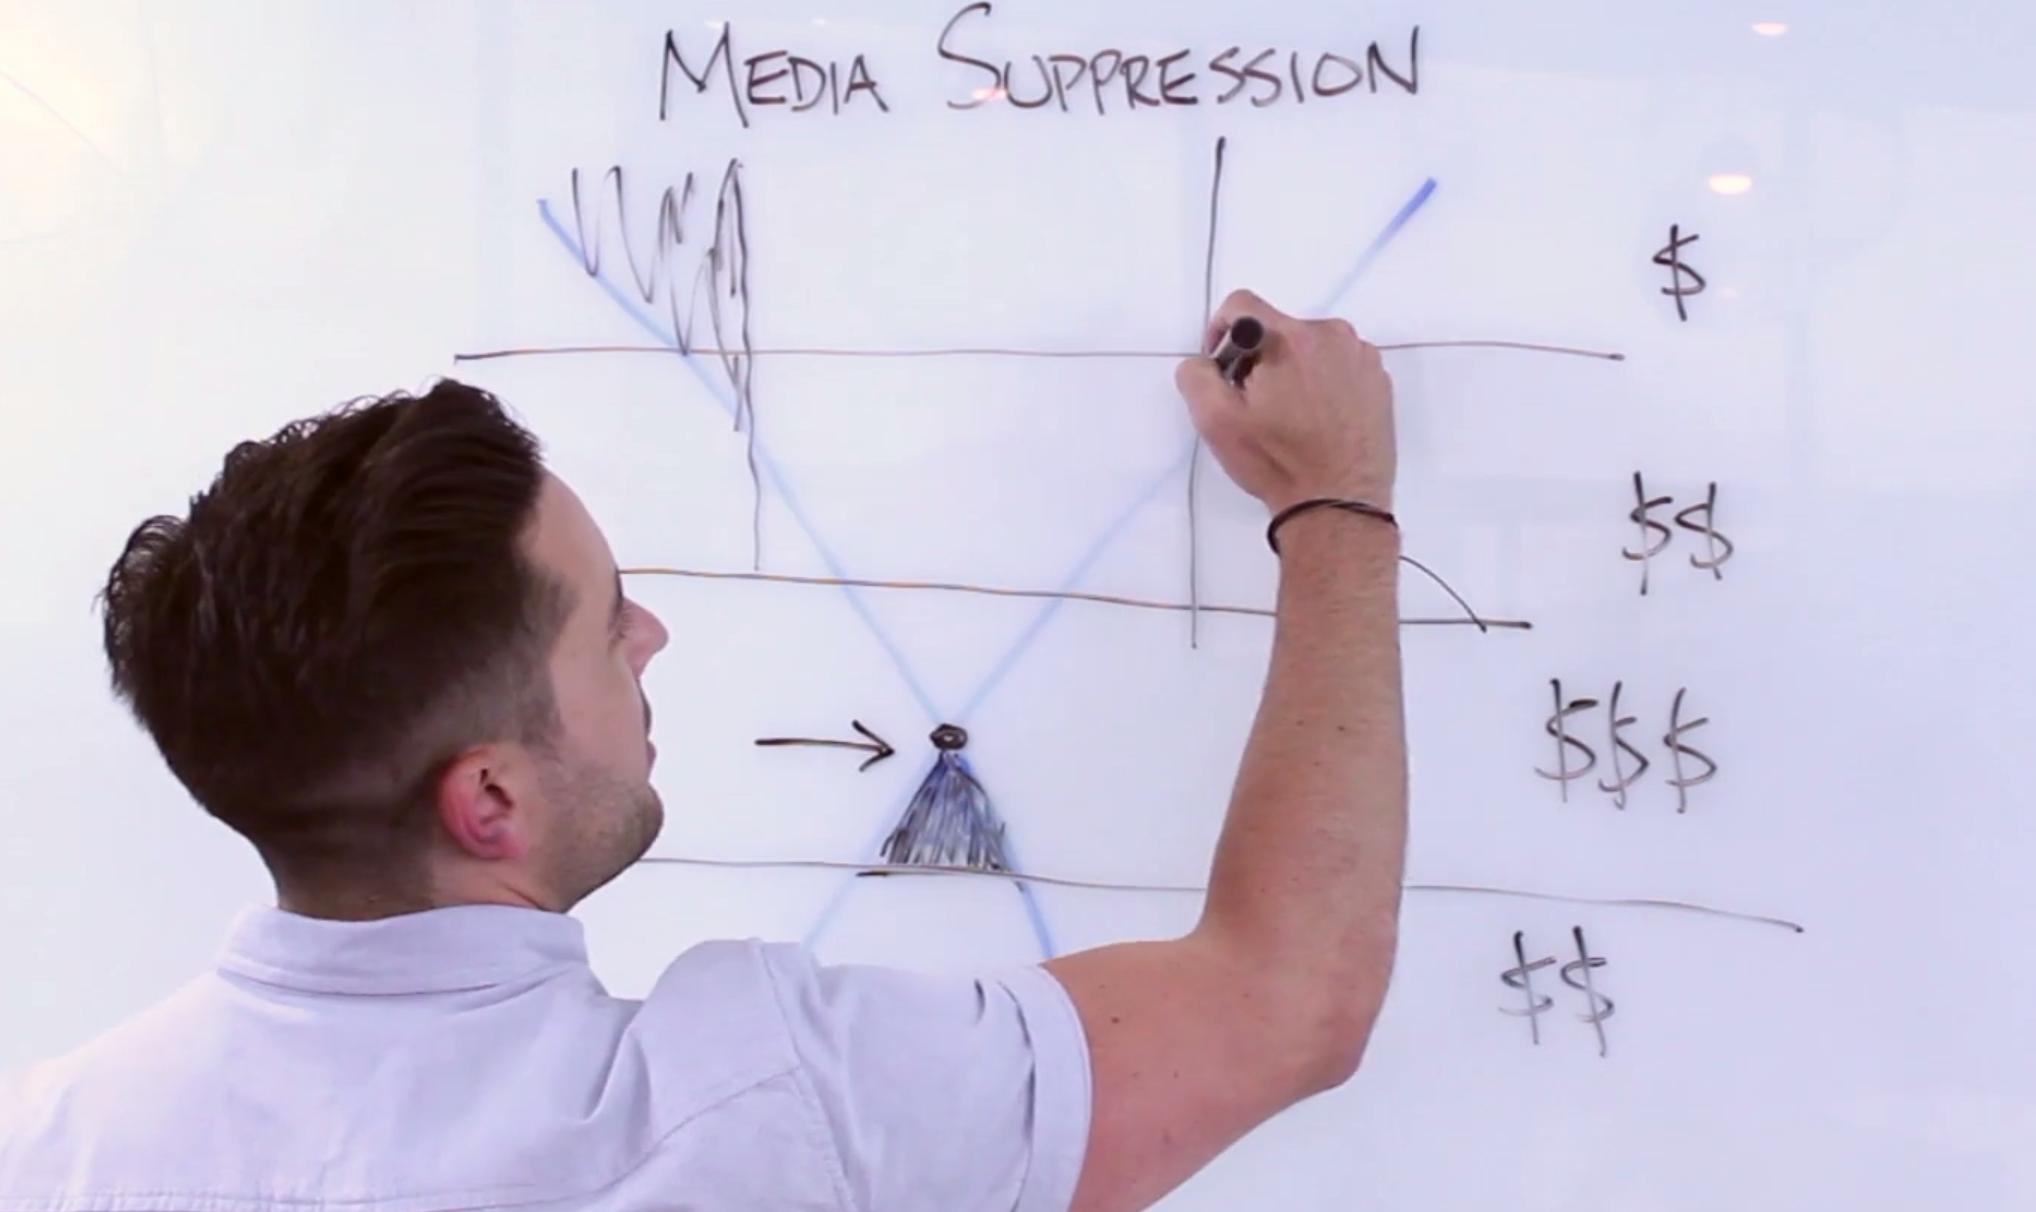 Video: Media Suppression Framework Session